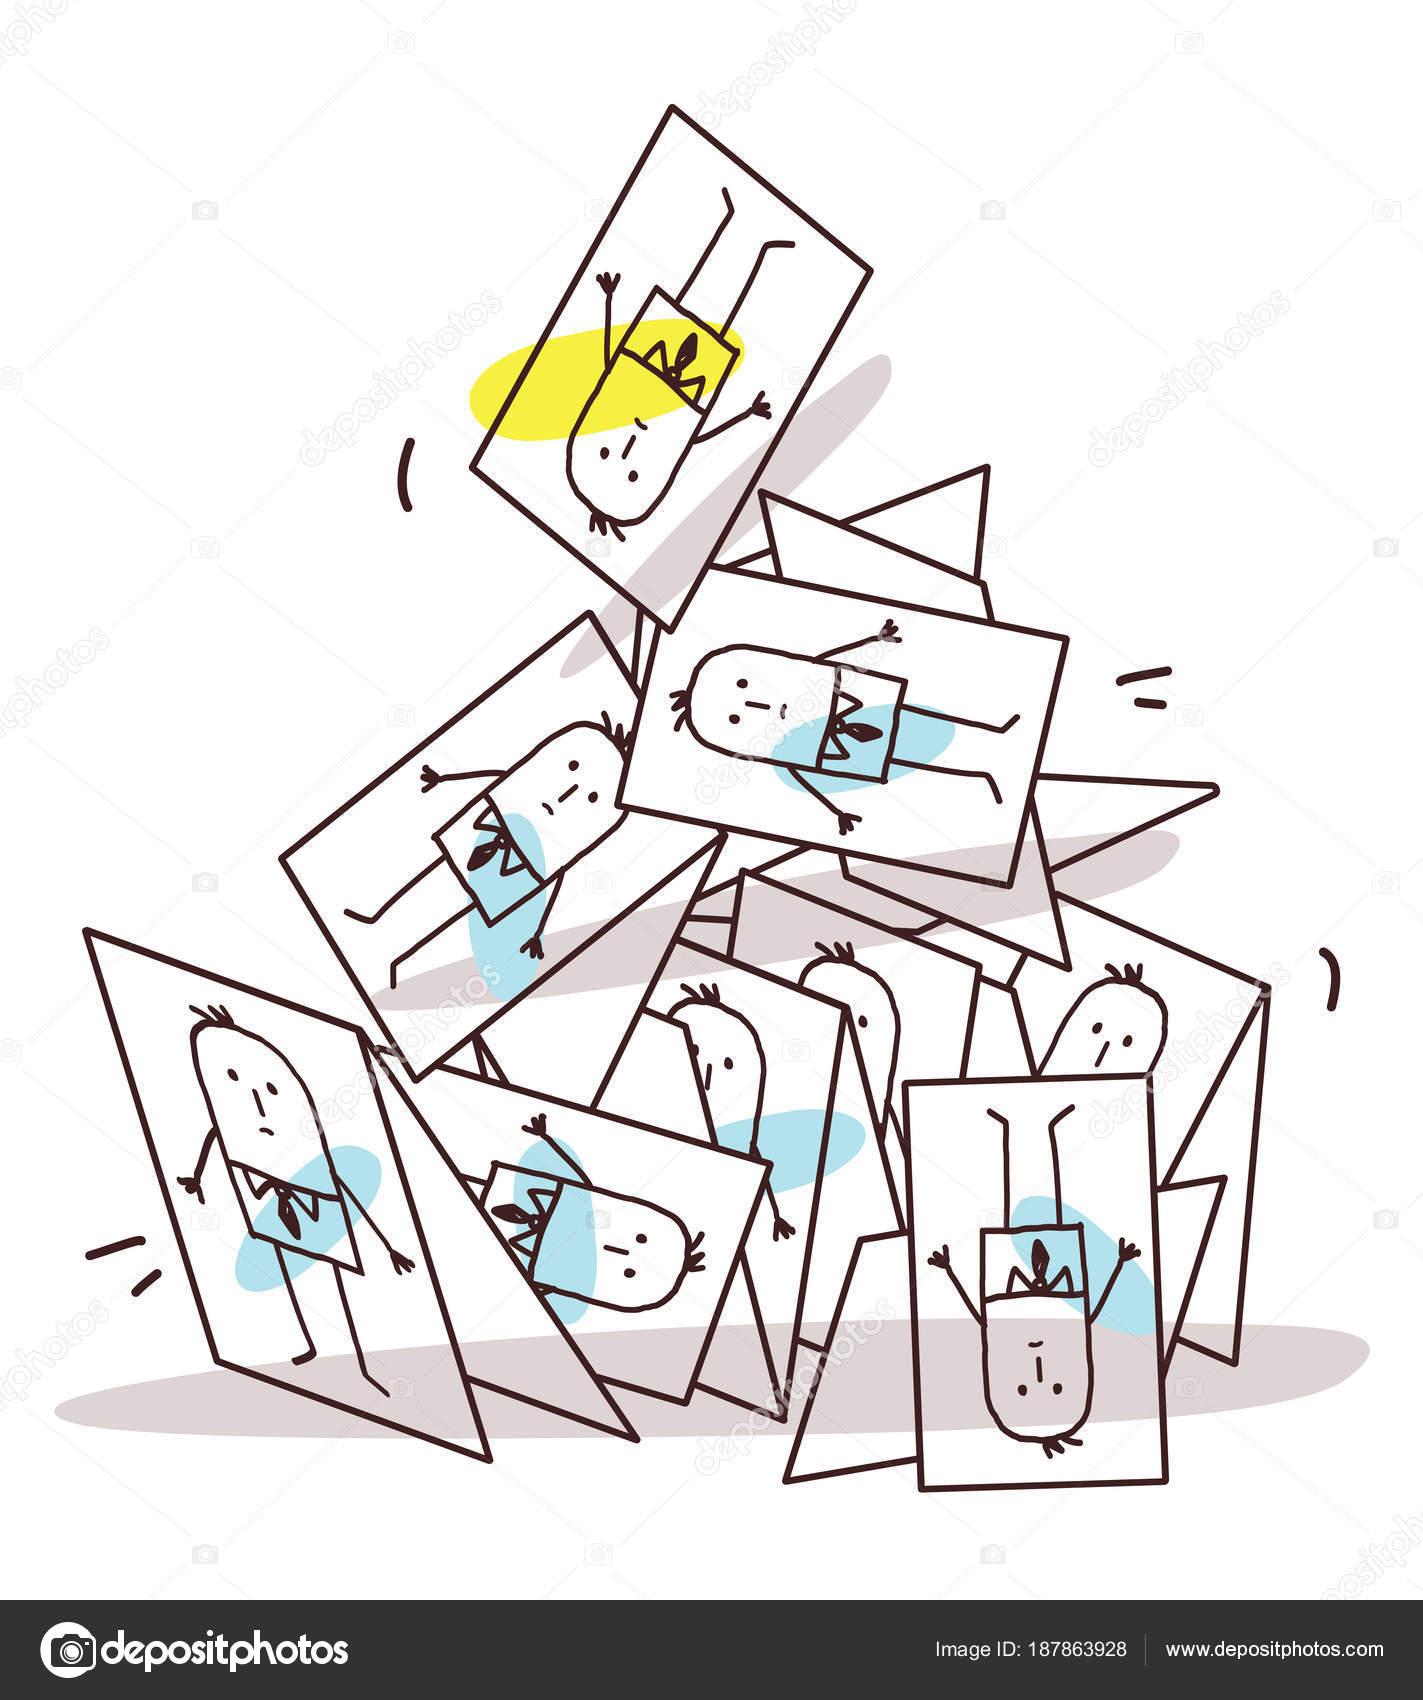 Dessin Anime Seffondrant Pyramide De Cartes Visite Illustration Stock